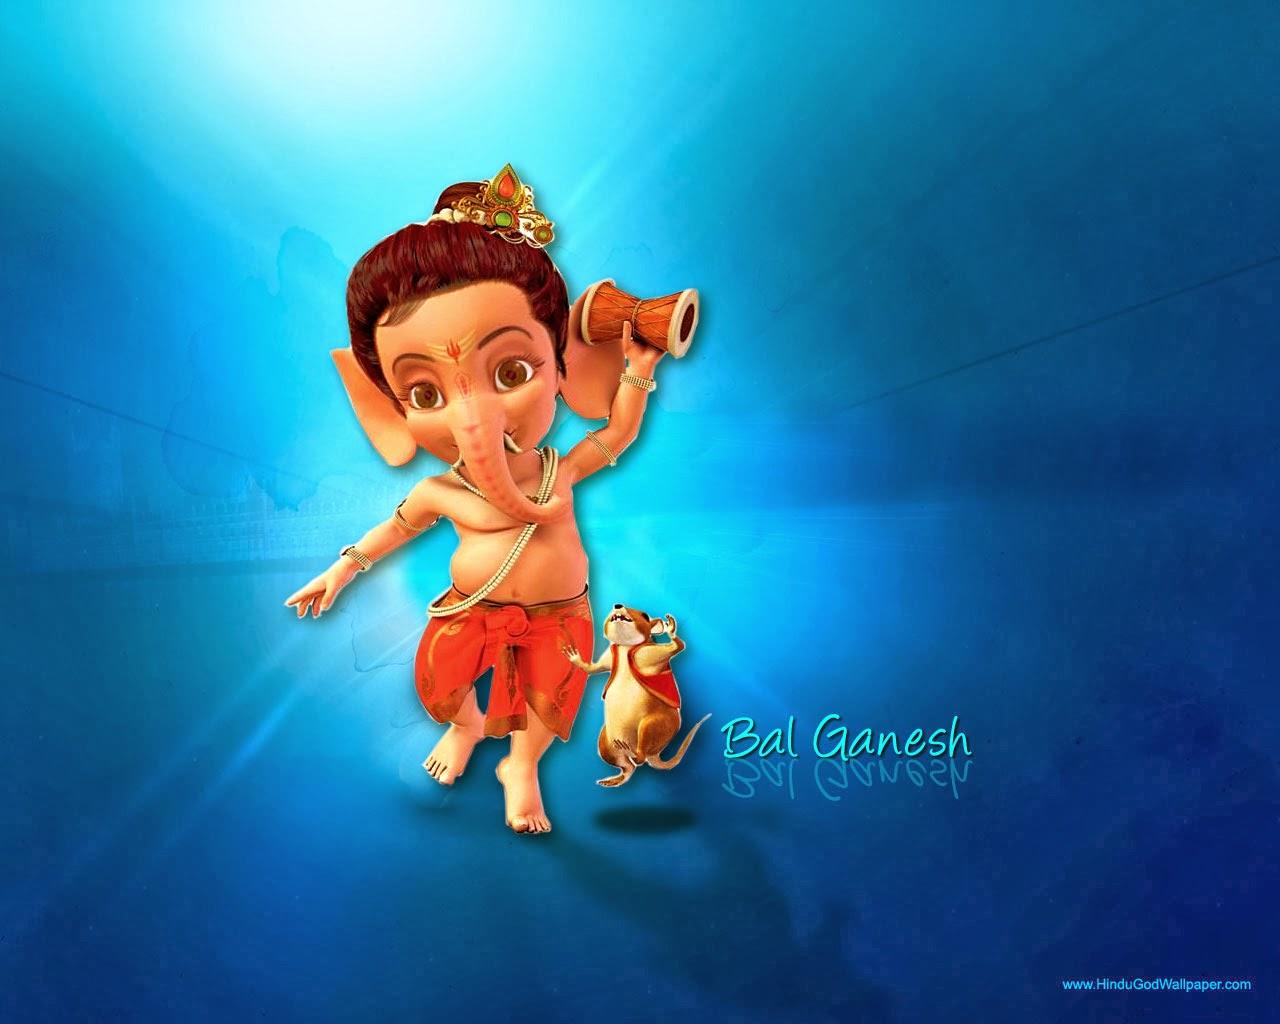 BAL GANESHA   Hindu God Wallpapers Download